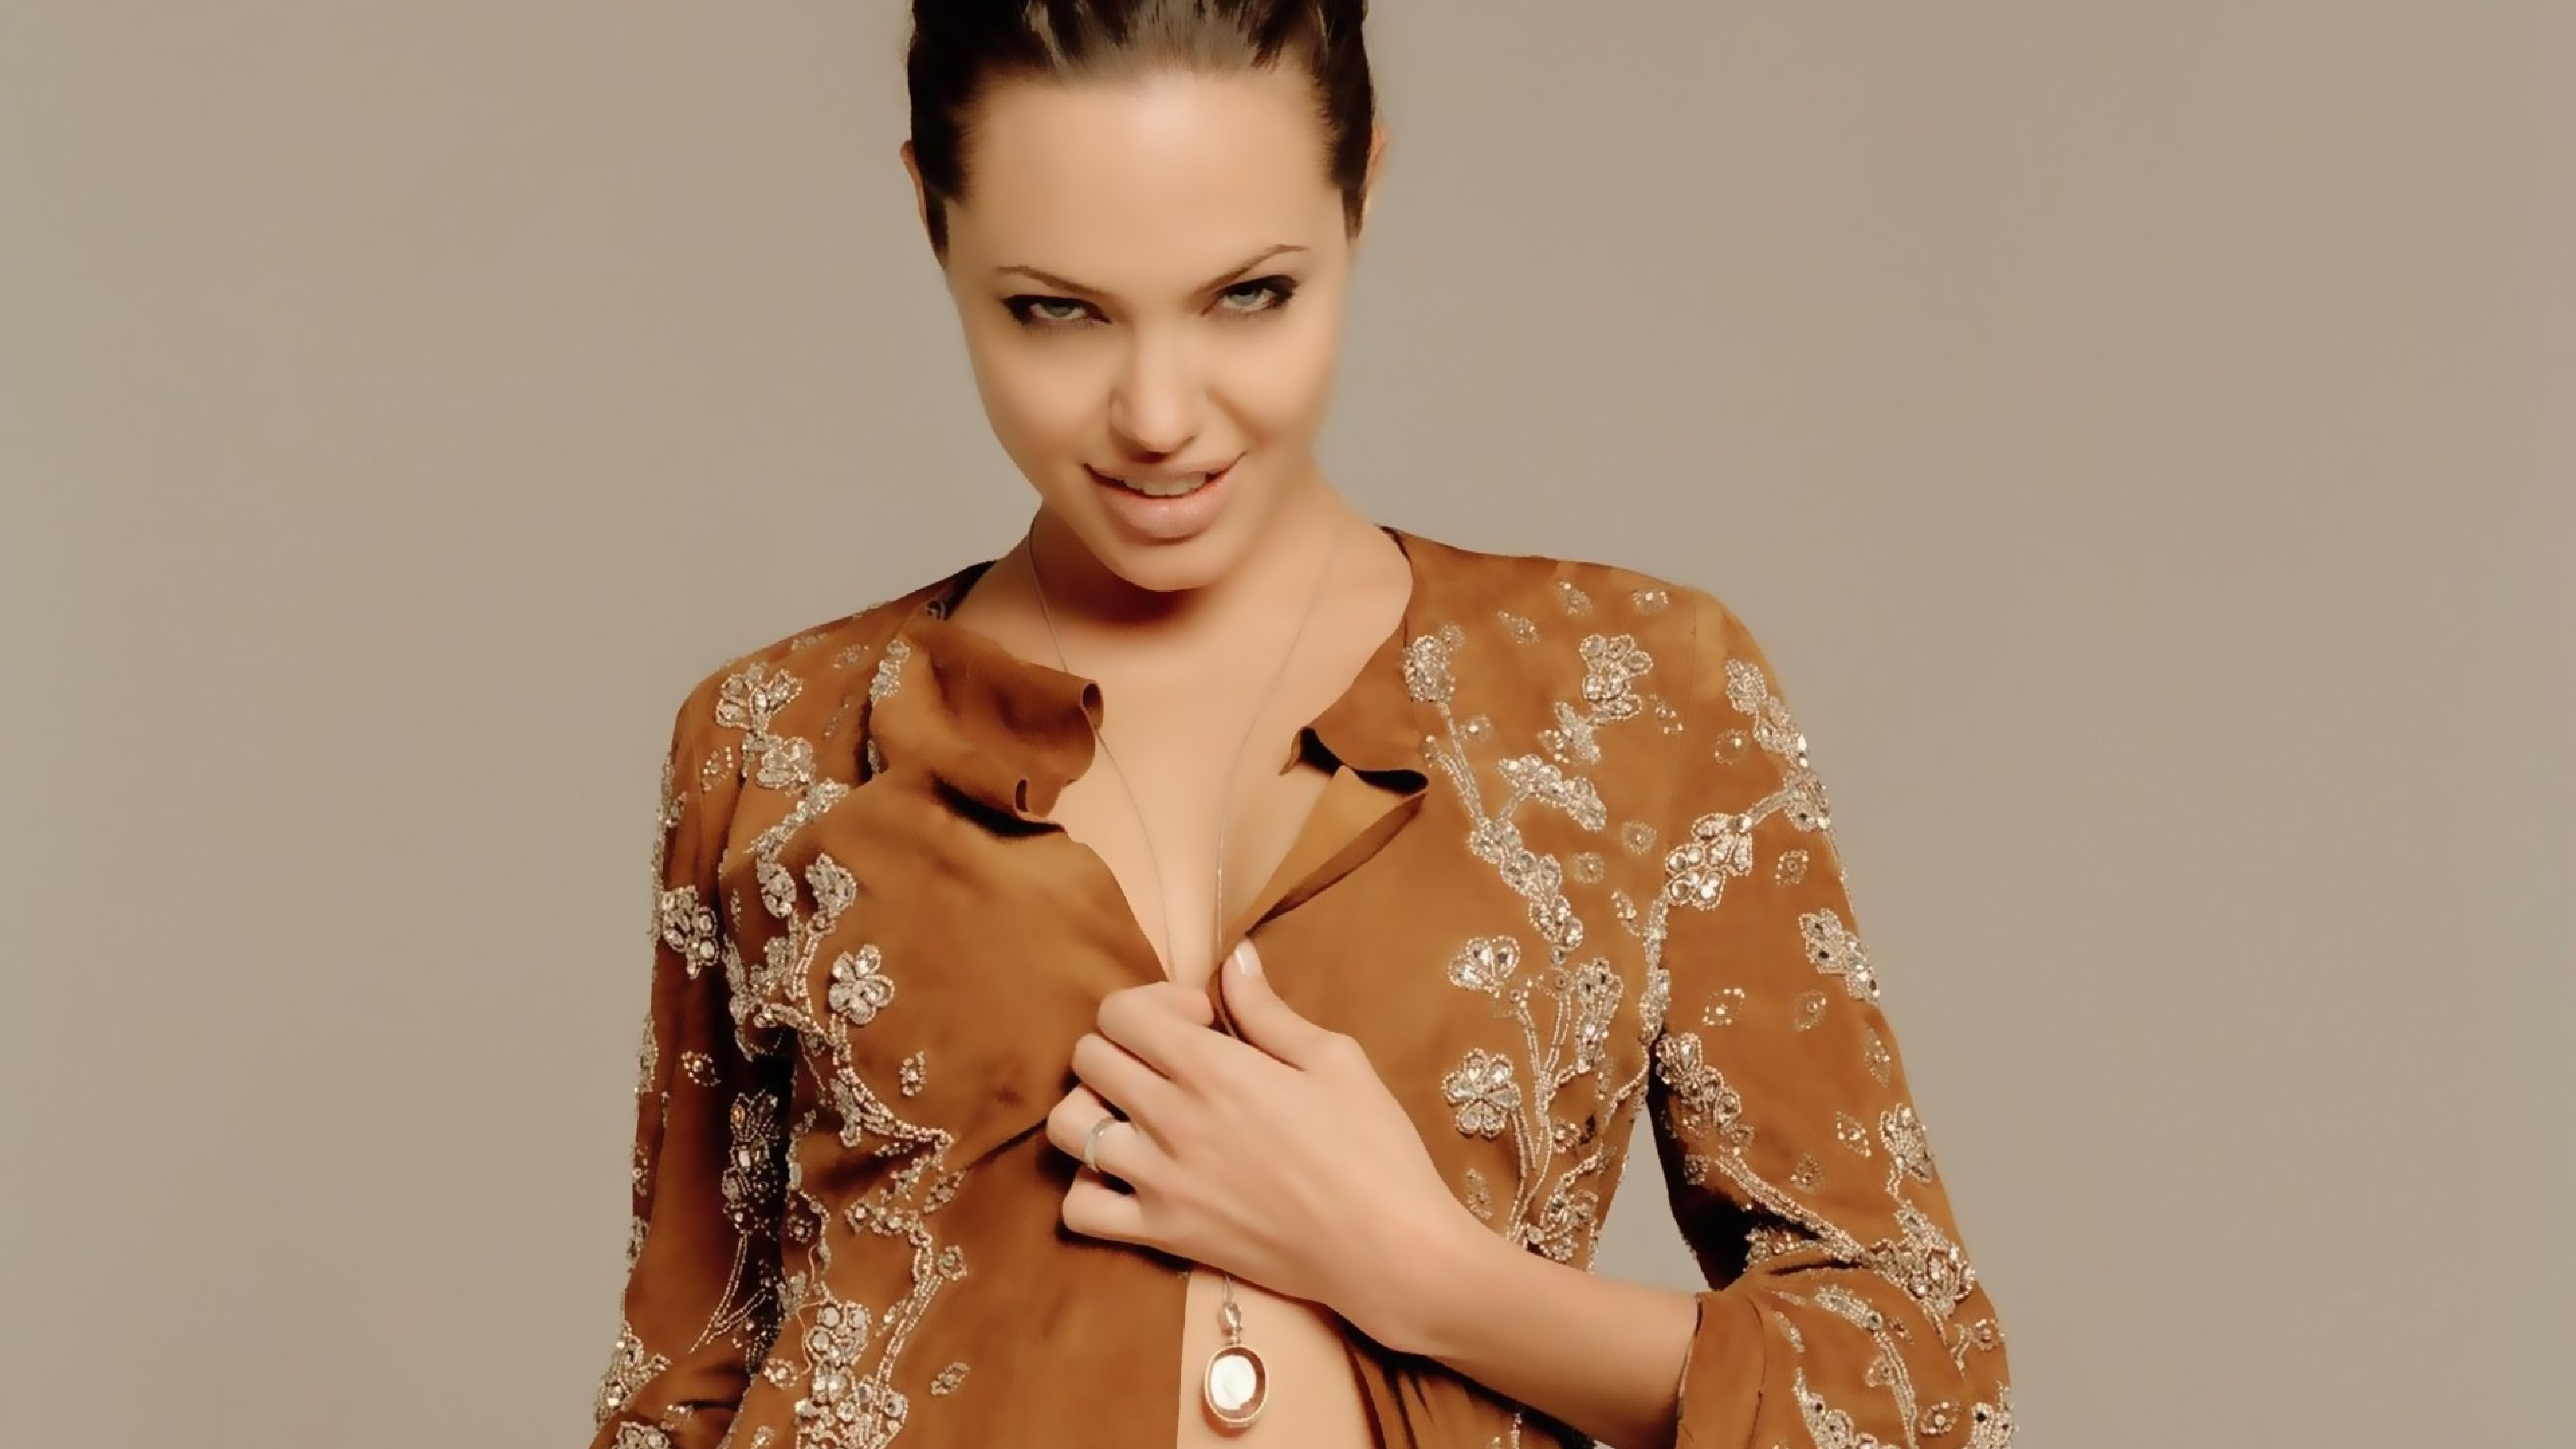 Download Angelina Jolie Sexy Photoshoot 1600X1200 Resolution, Full Hd Wallpaper-7993